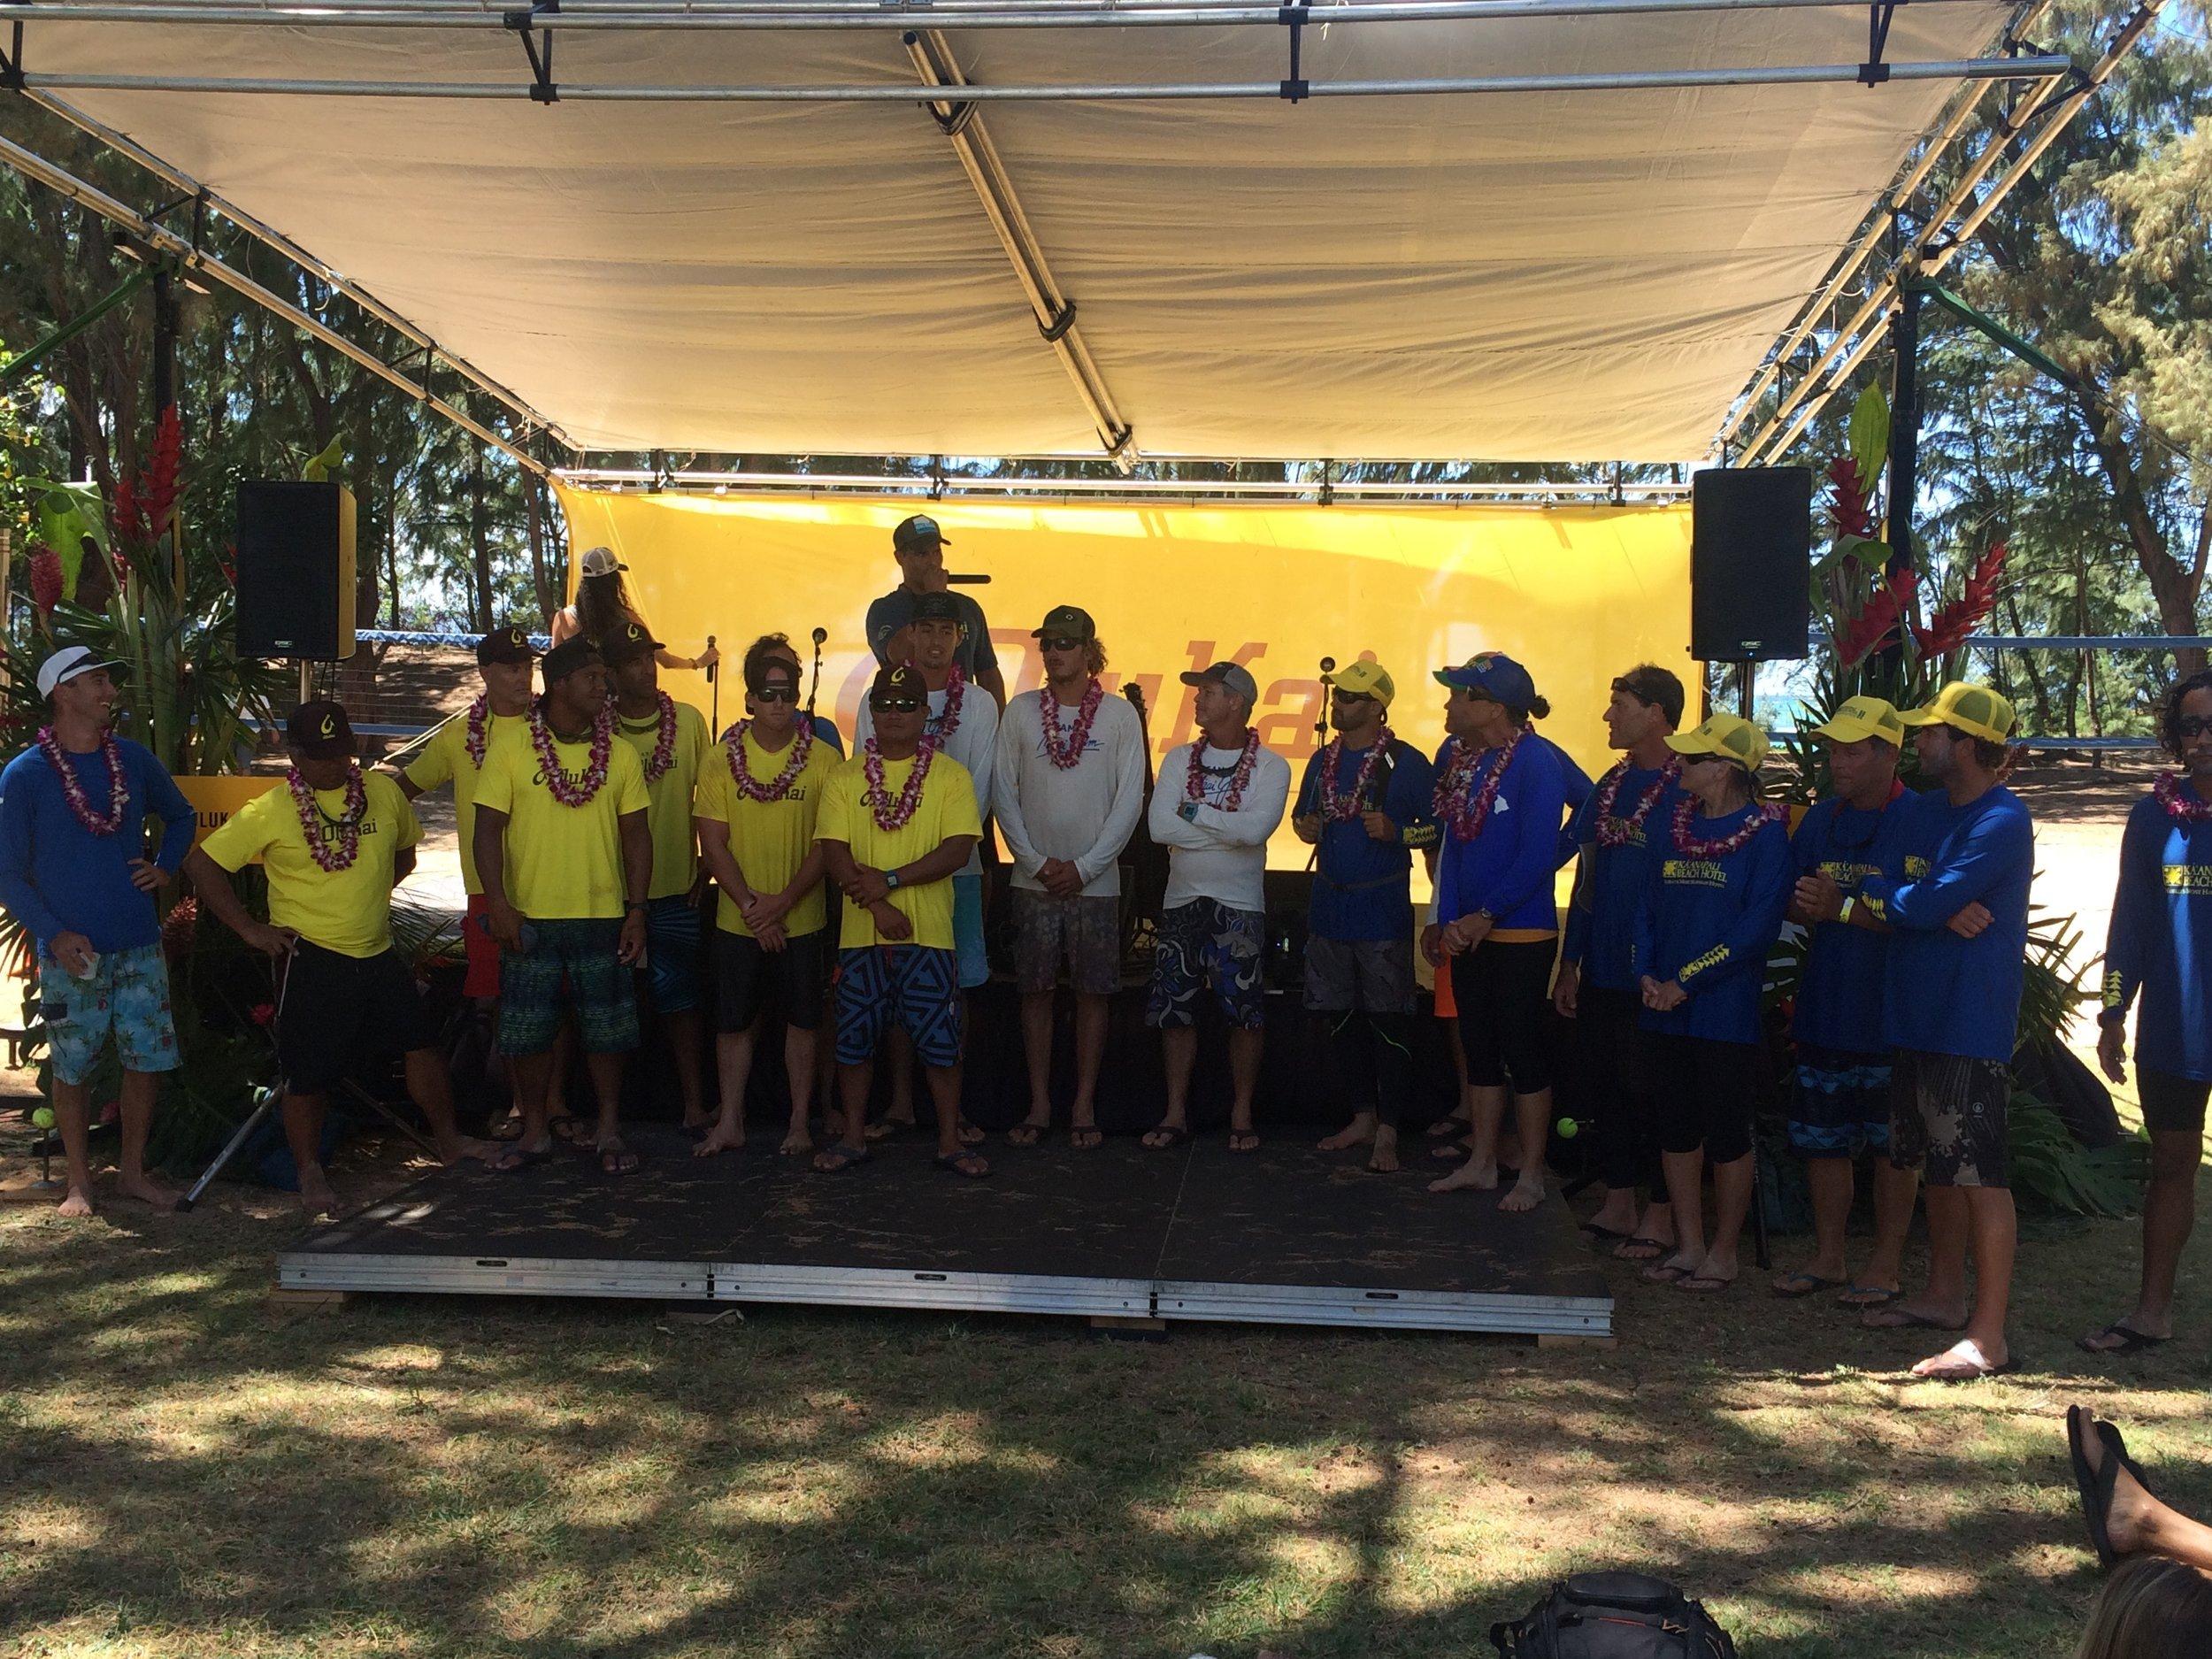 hawaiian_sailing_canoe_champ